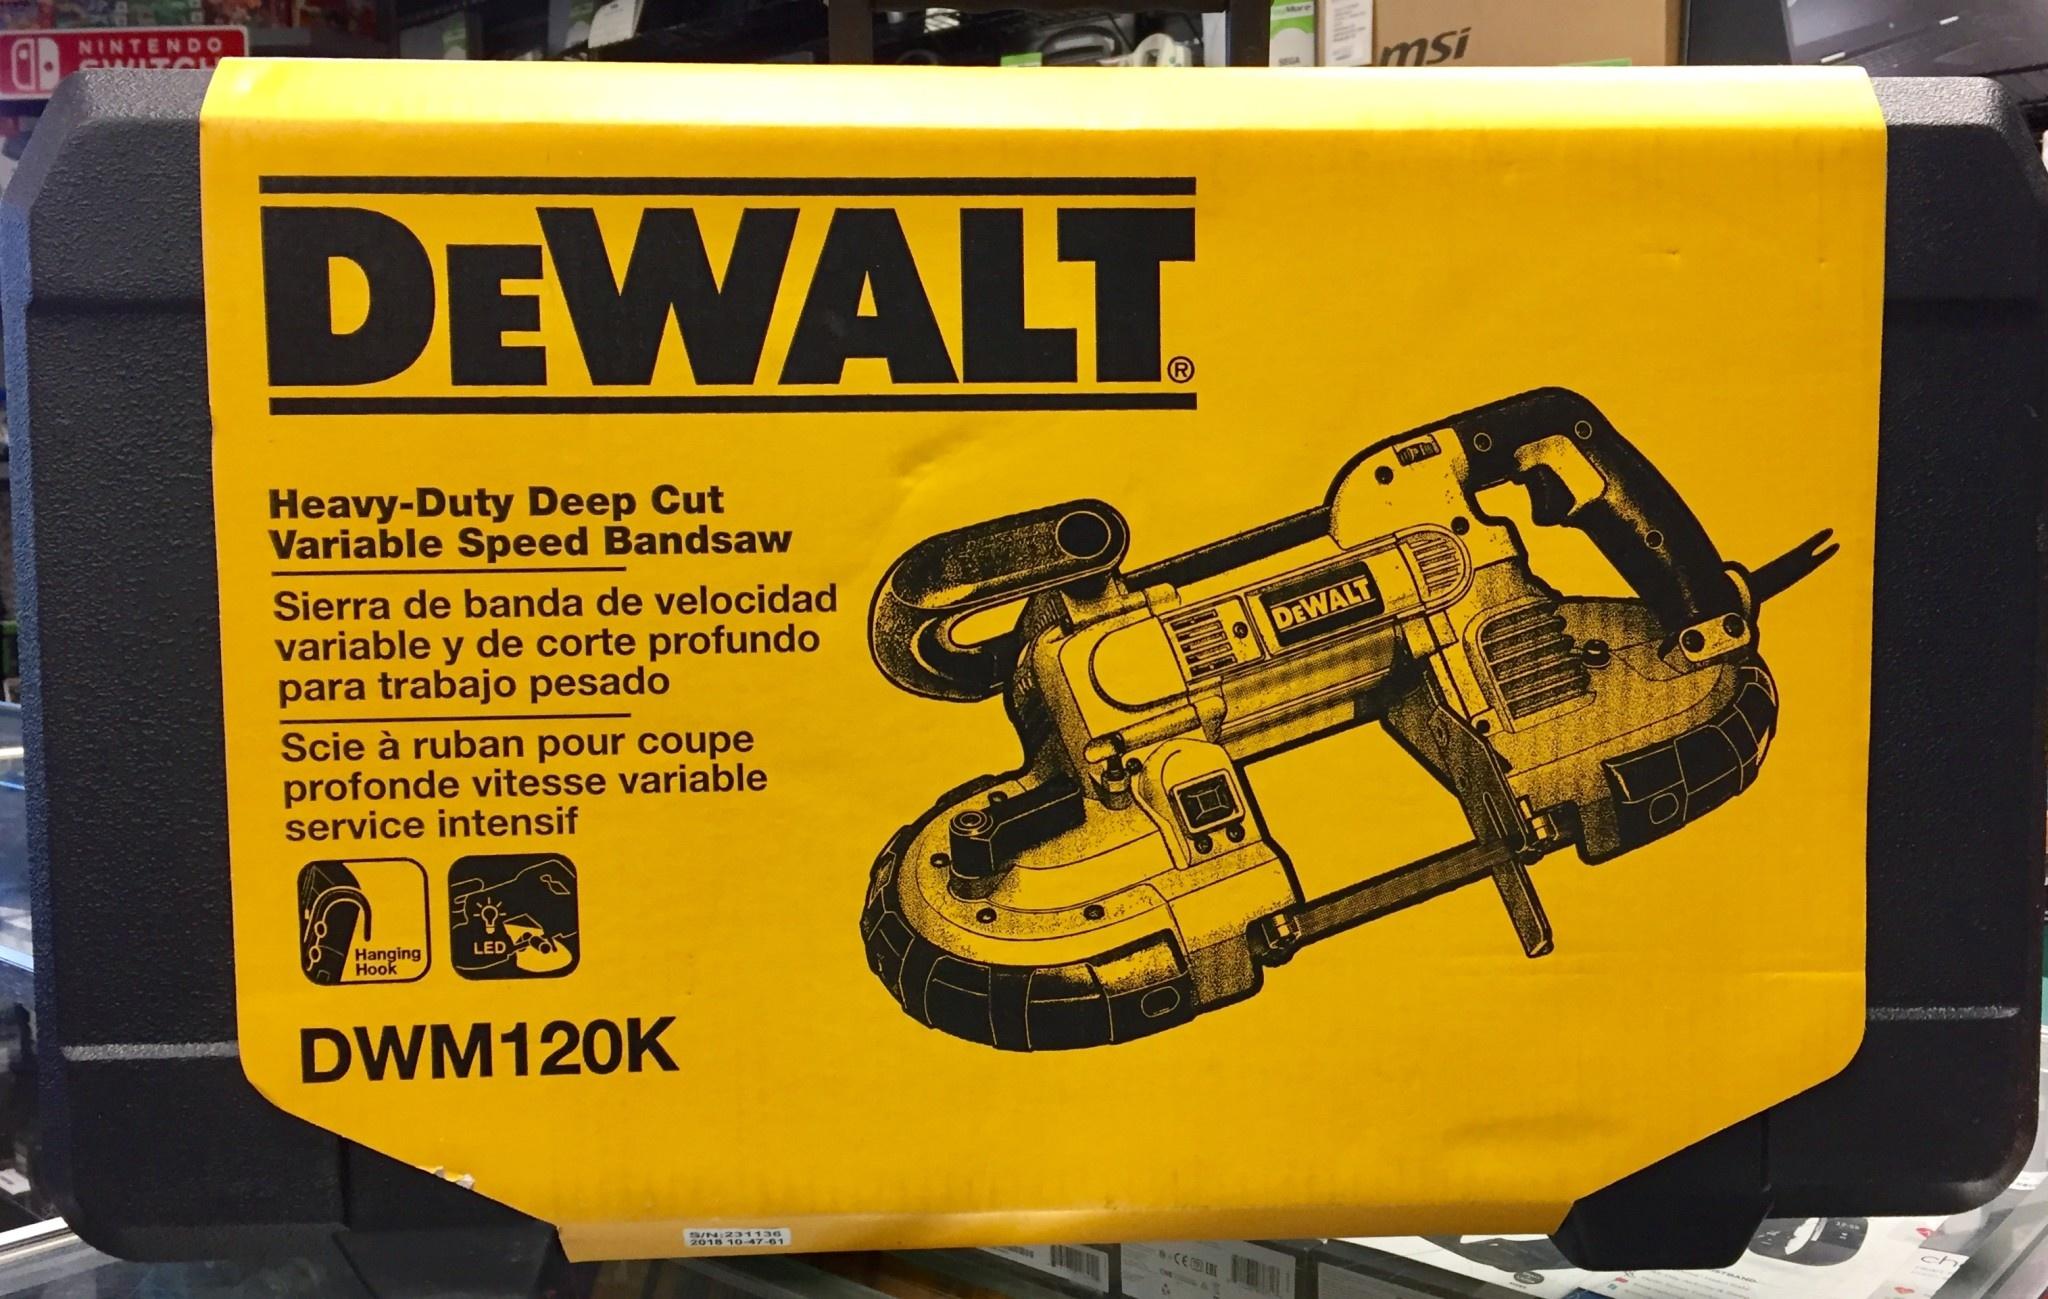 New - DeWALT DWM120K Variable-Speed Deep Cut Portable Band Saw